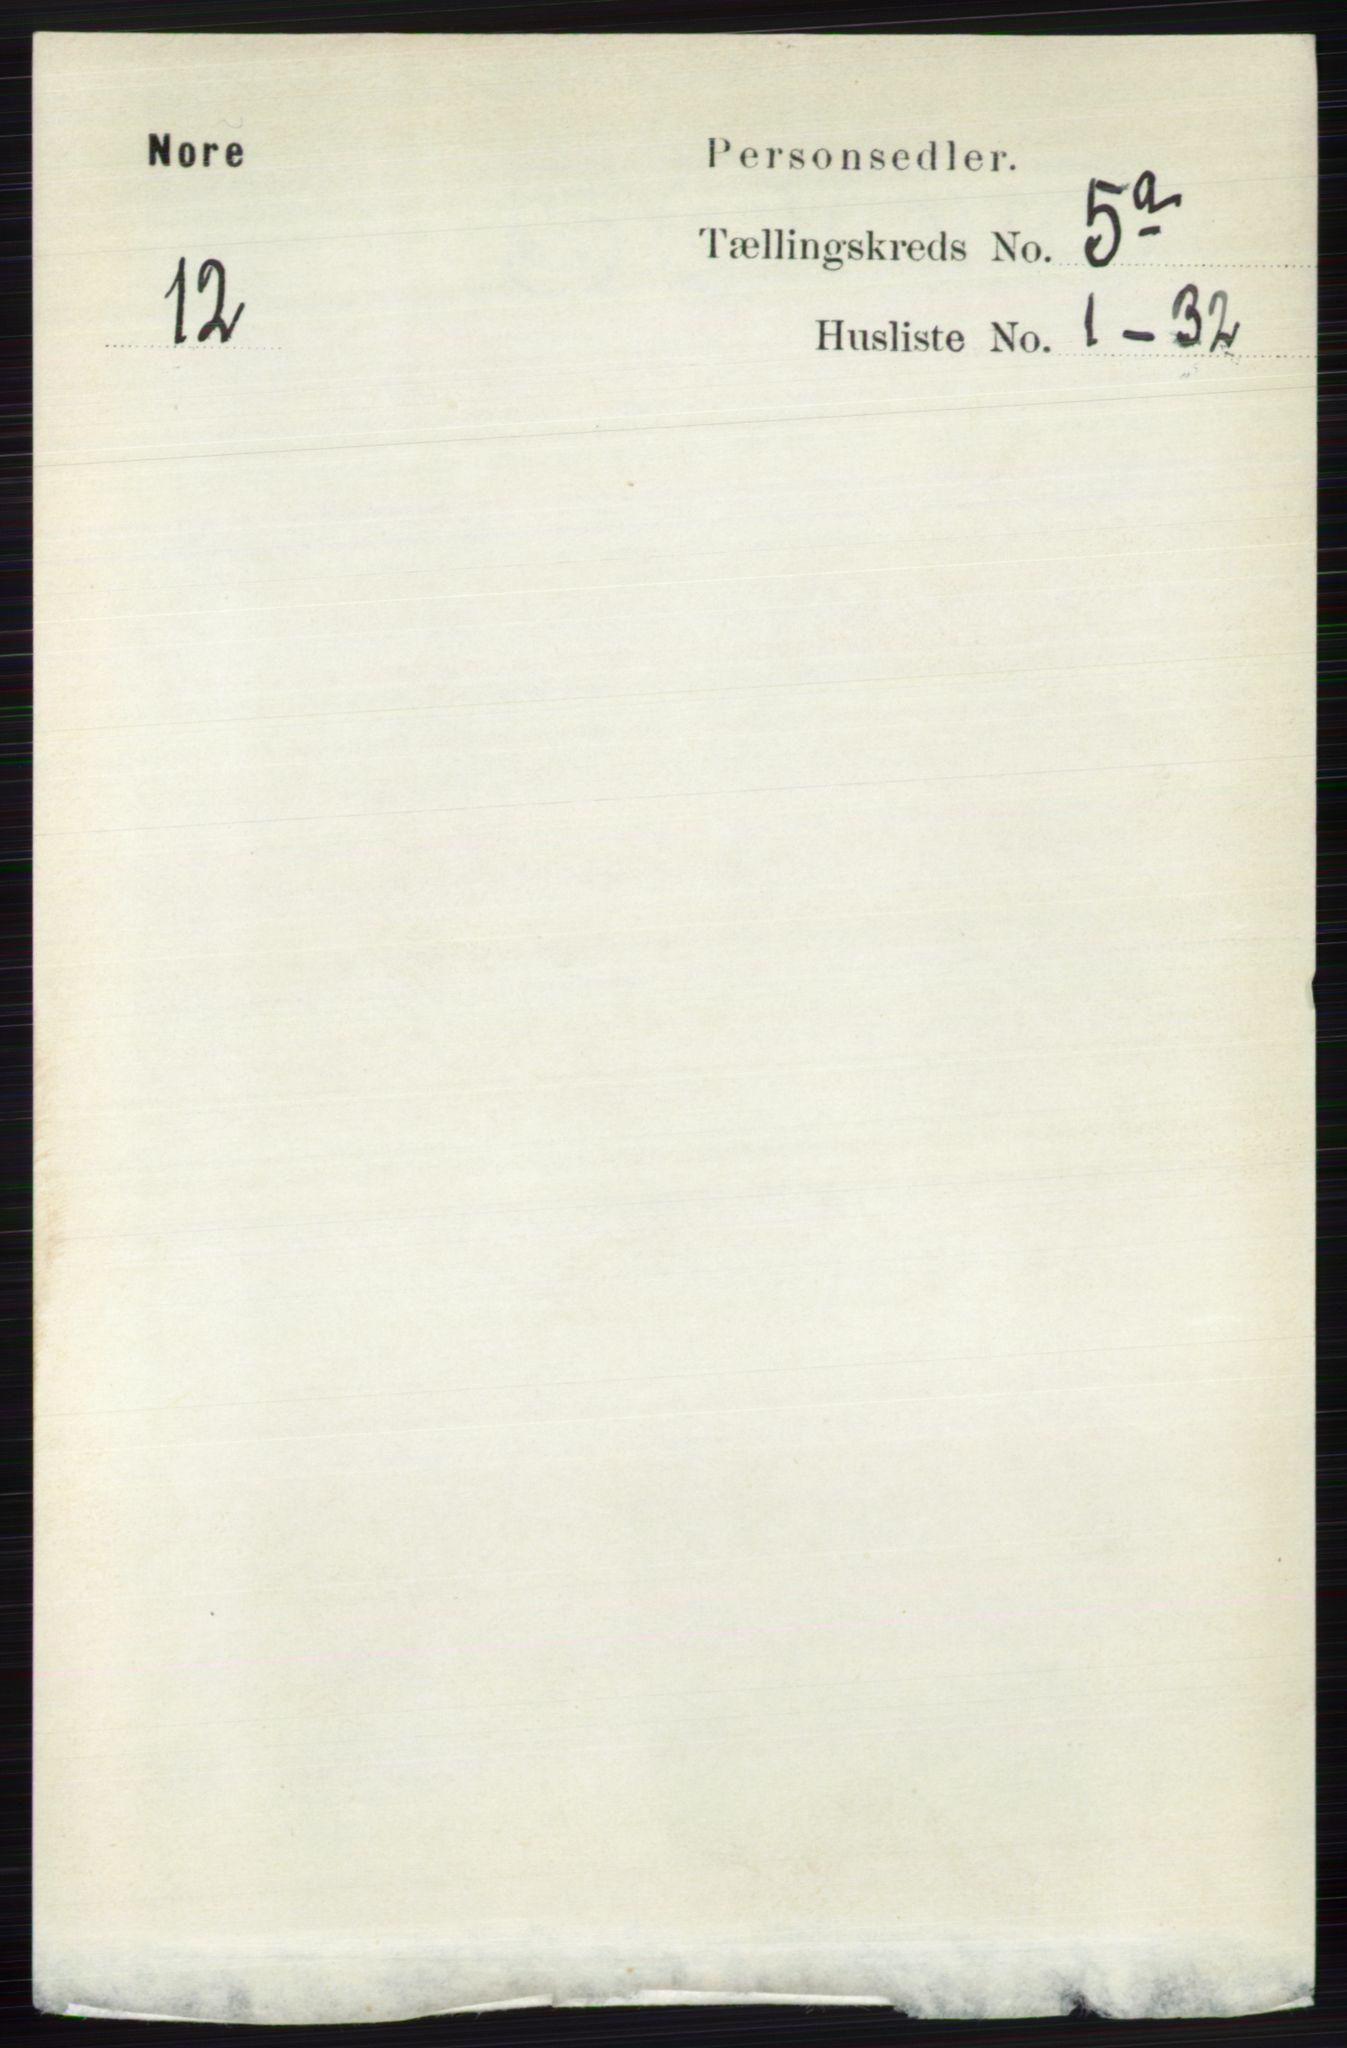 RA, Folketelling 1891 for 0633 Nore herred, 1891, s. 1563